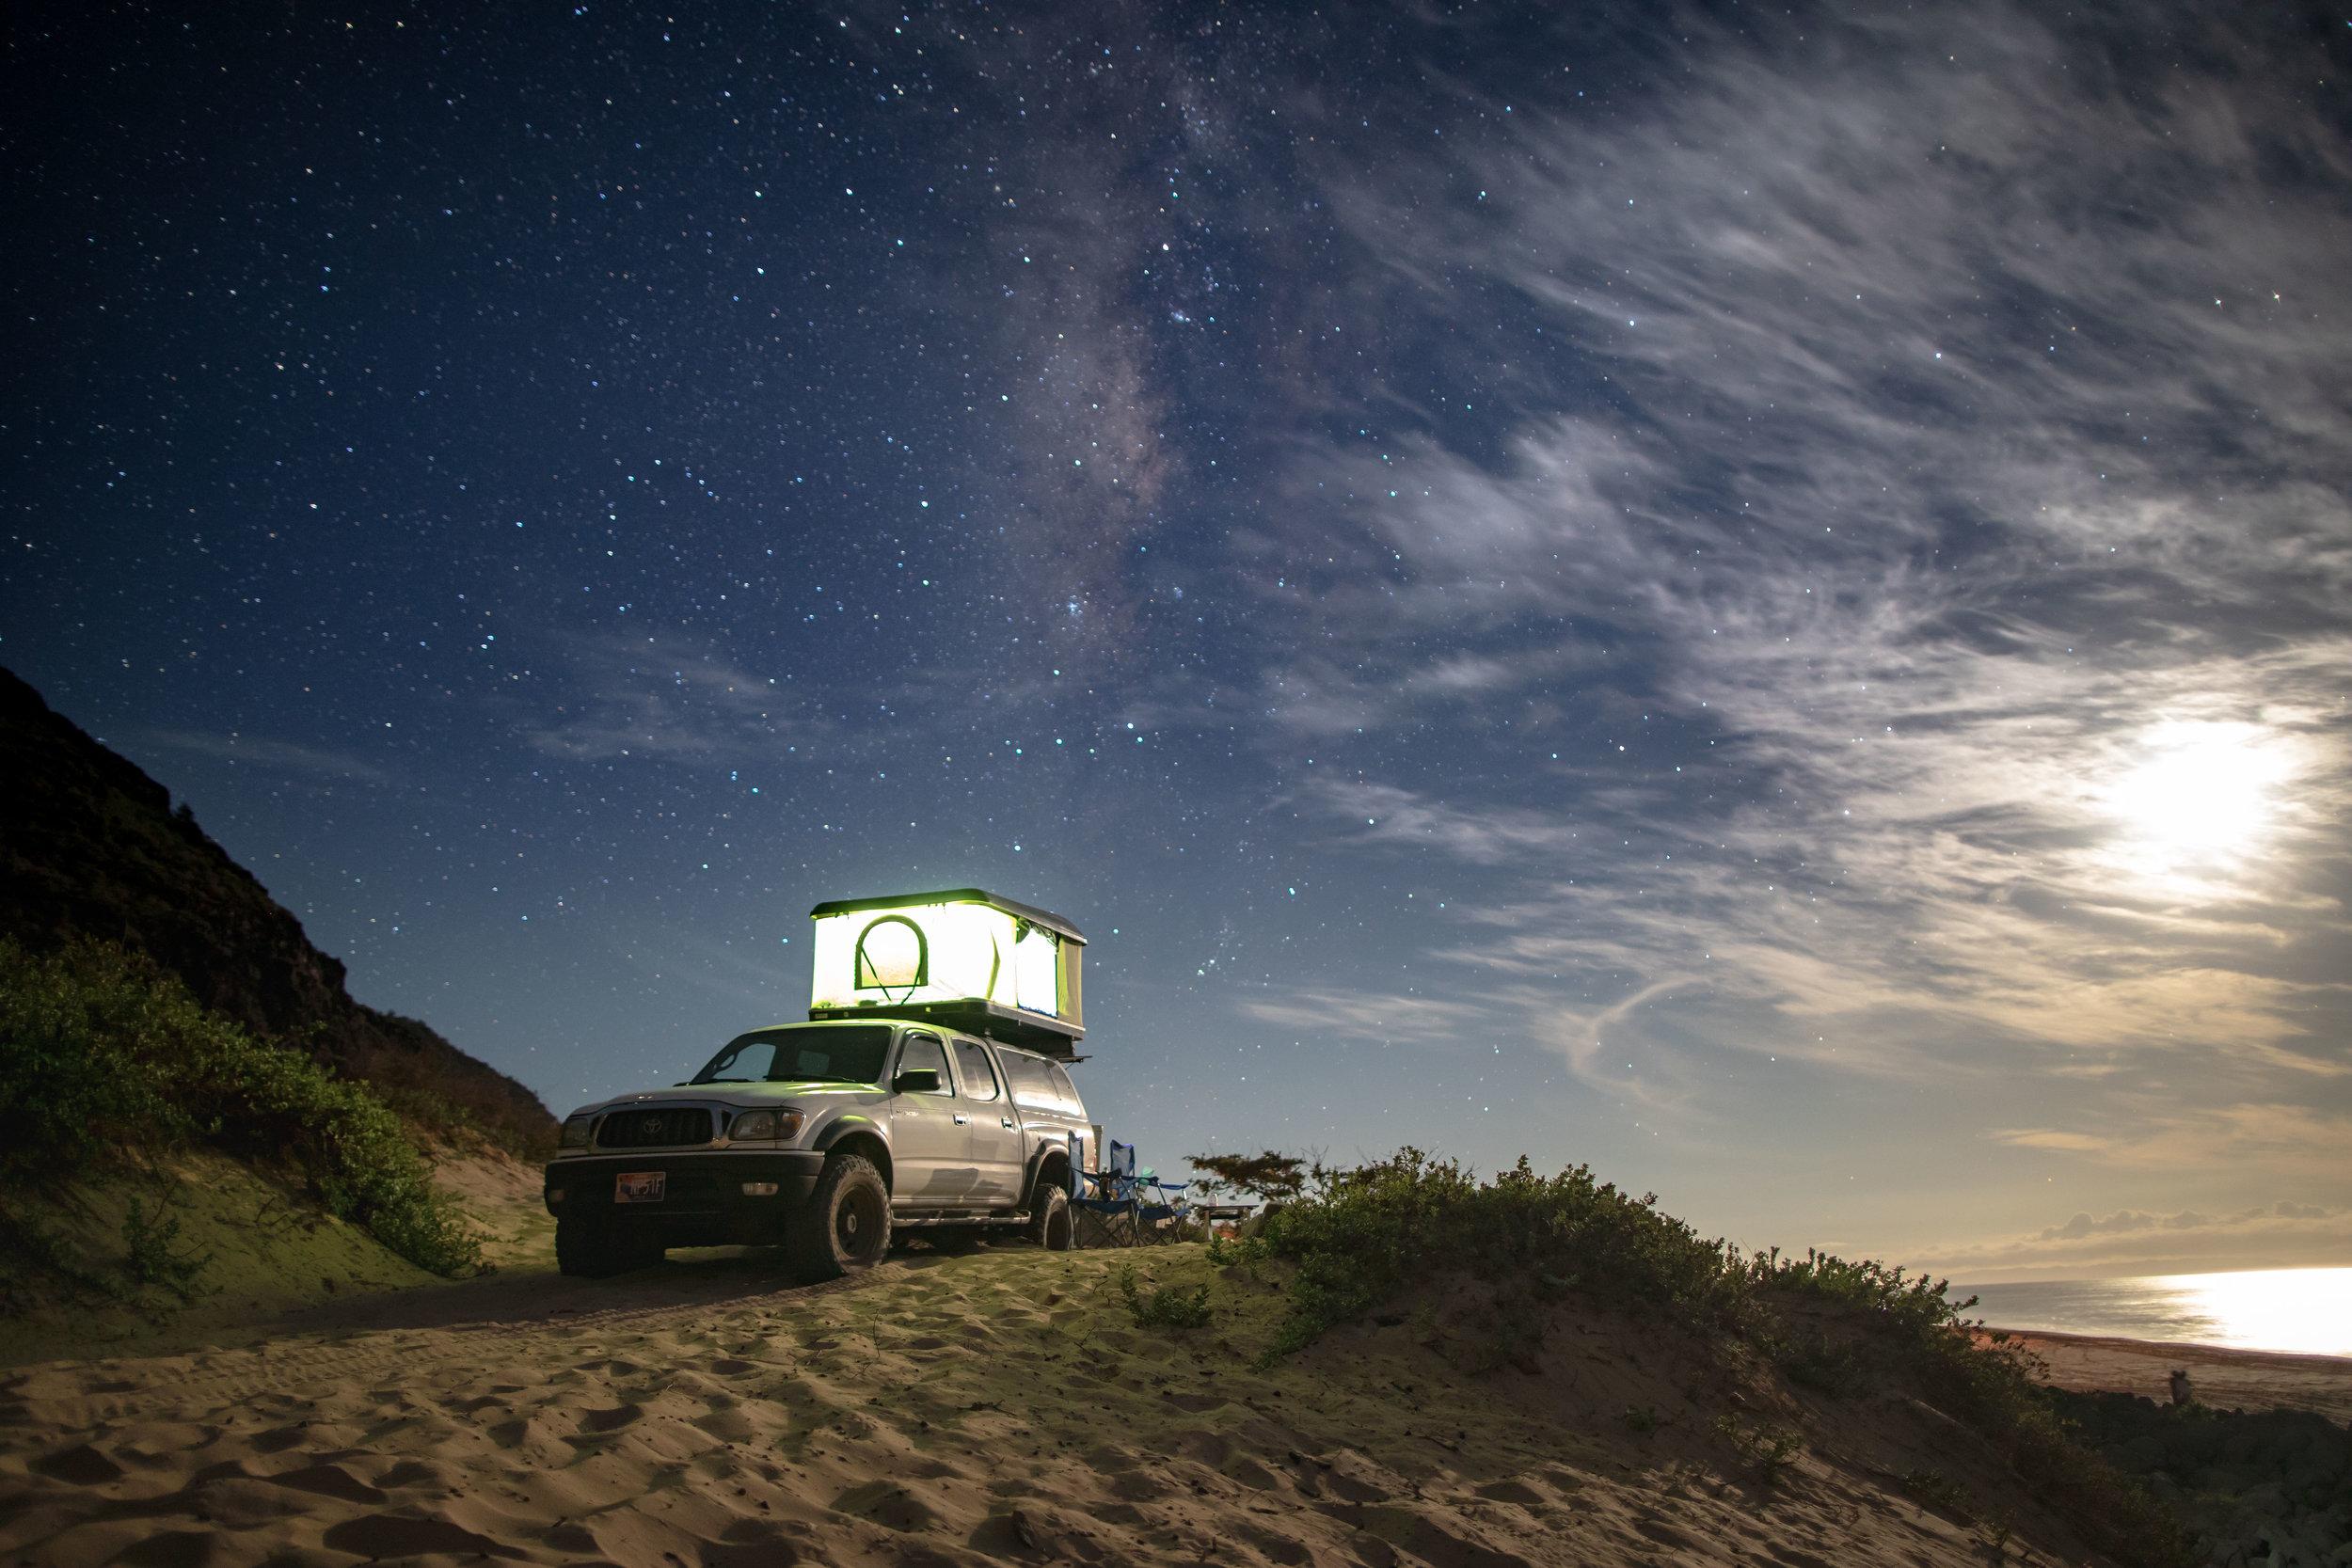 kauai-camping-occean-beach-polihale-kauai overlander-7.jpg